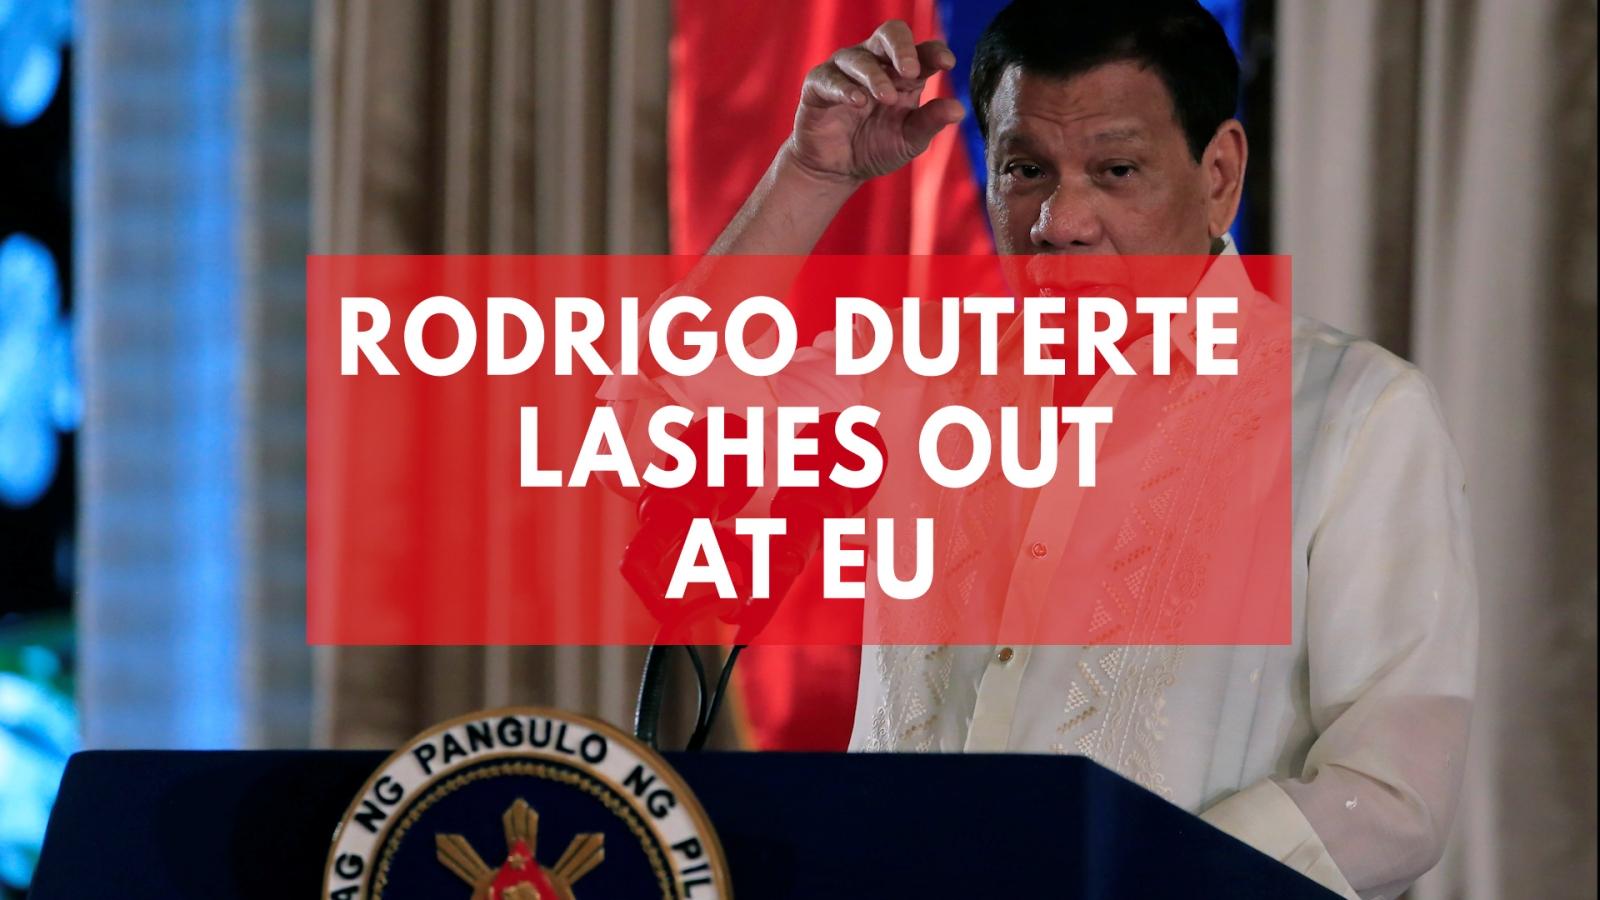 Philippines' Duterte lashes out at EU on UN expulsion threat